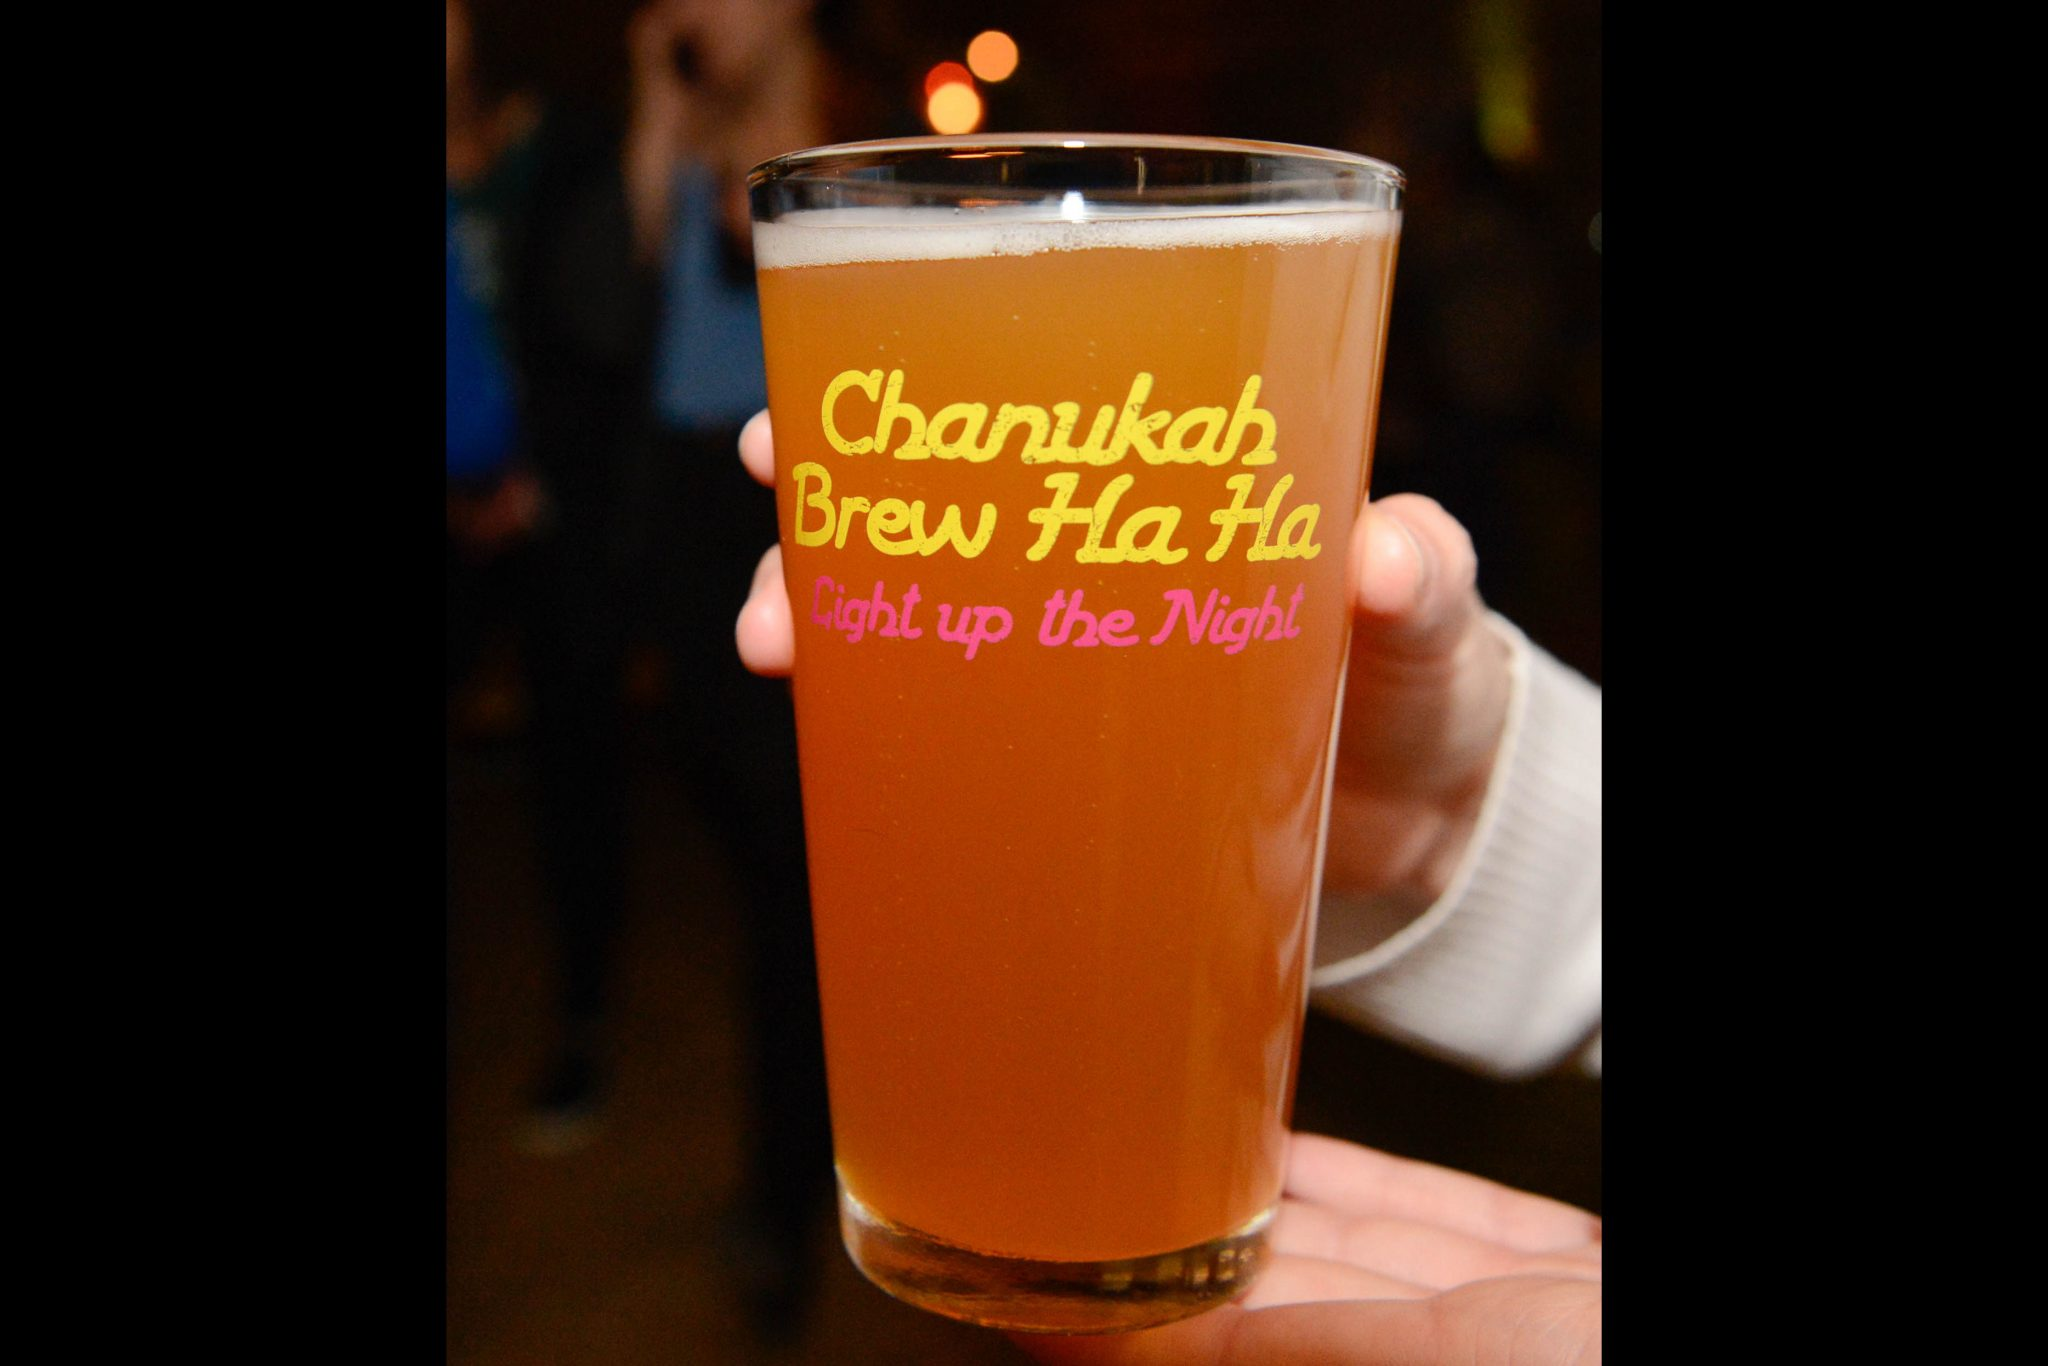 Chanukah Brew Ha Ha